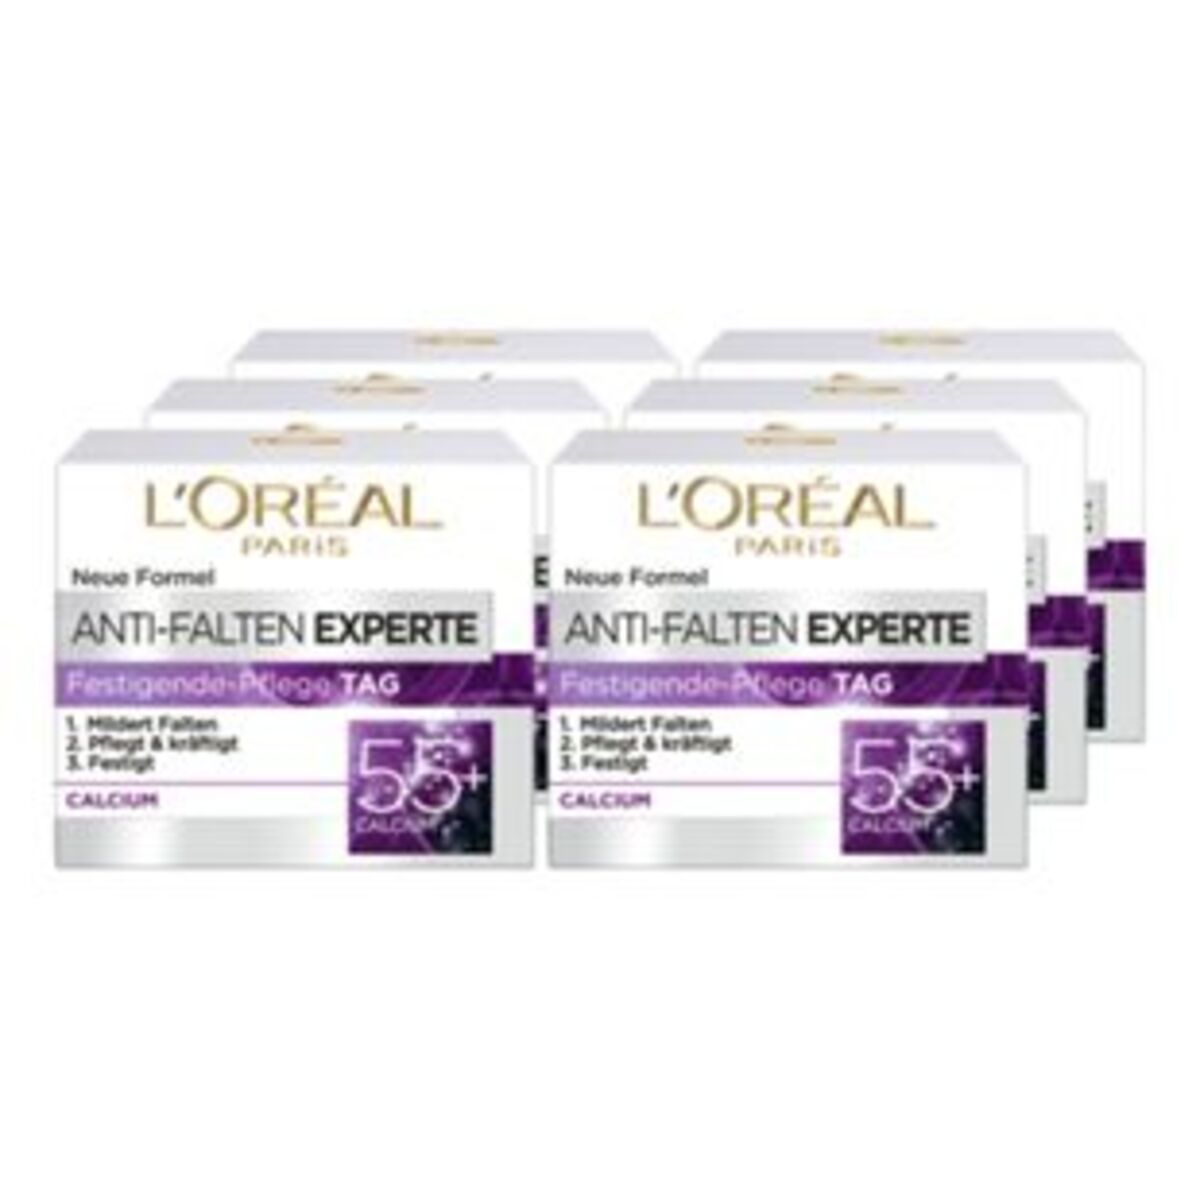 Bild 2 von L'Oreal Expert Tagescreme 55+ 50 ml, 6er Pack